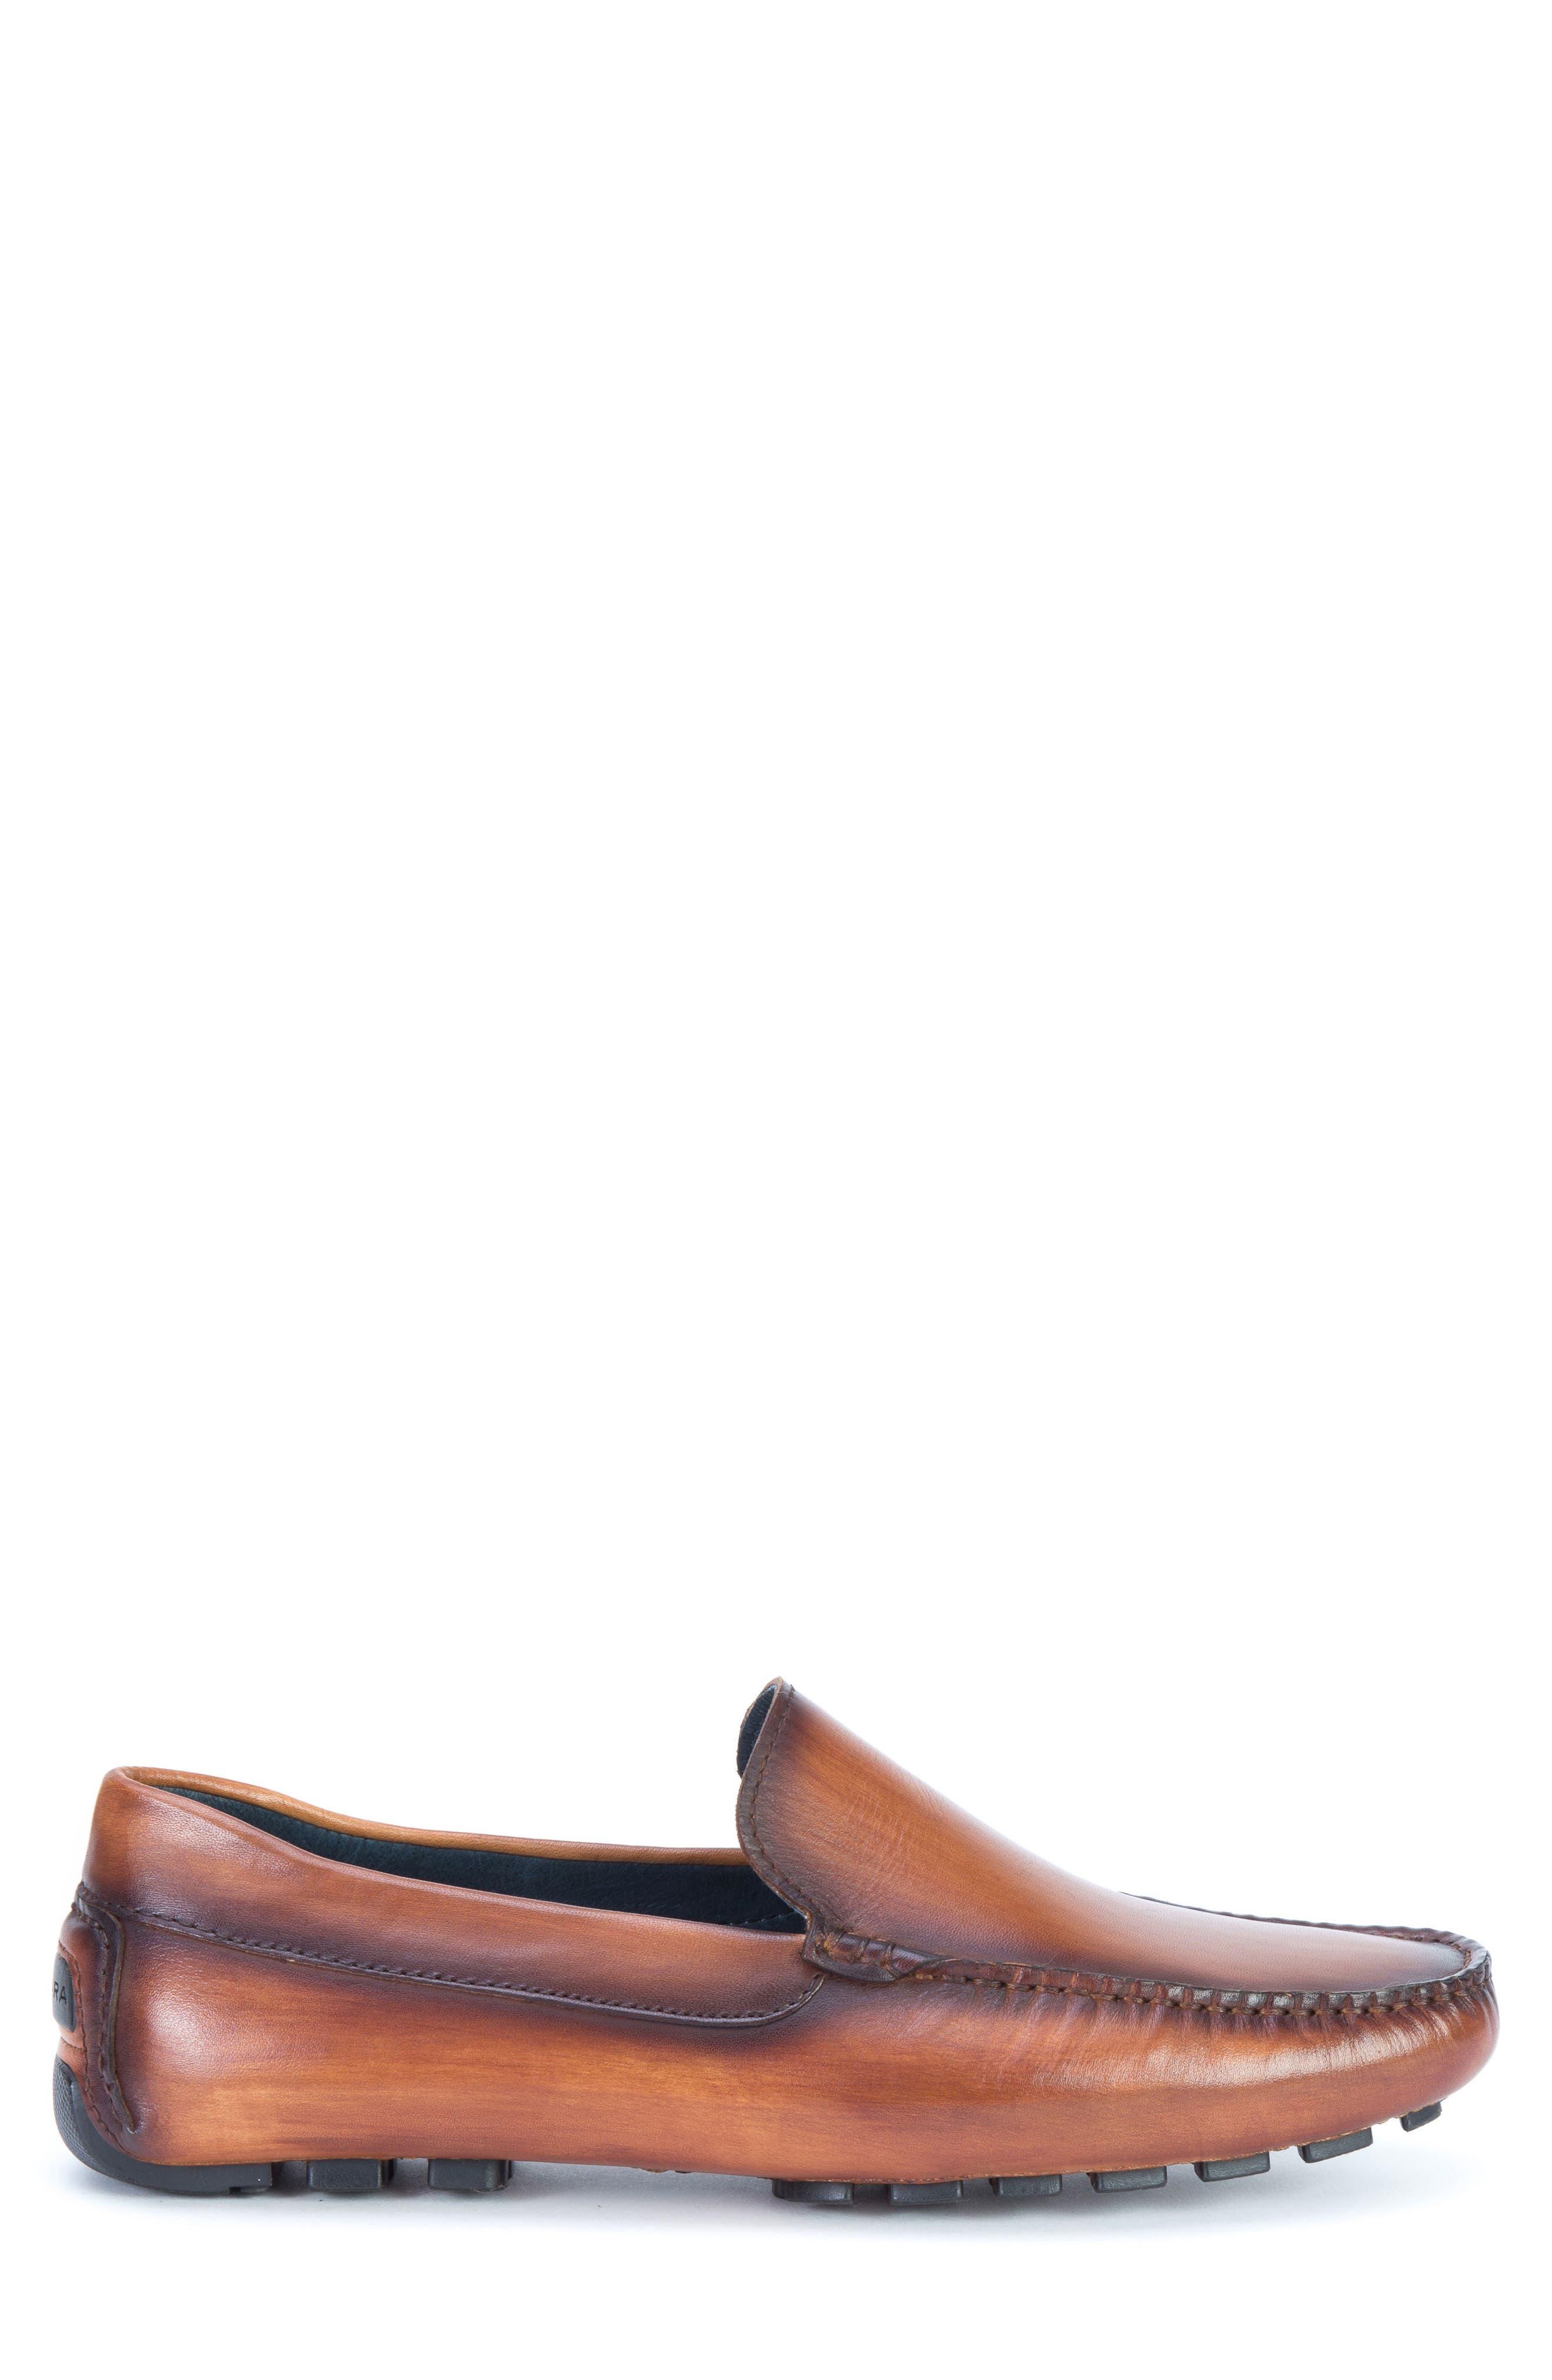 Matisse Driving Moccasin,                             Alternate thumbnail 3, color,                             Cognac Leather